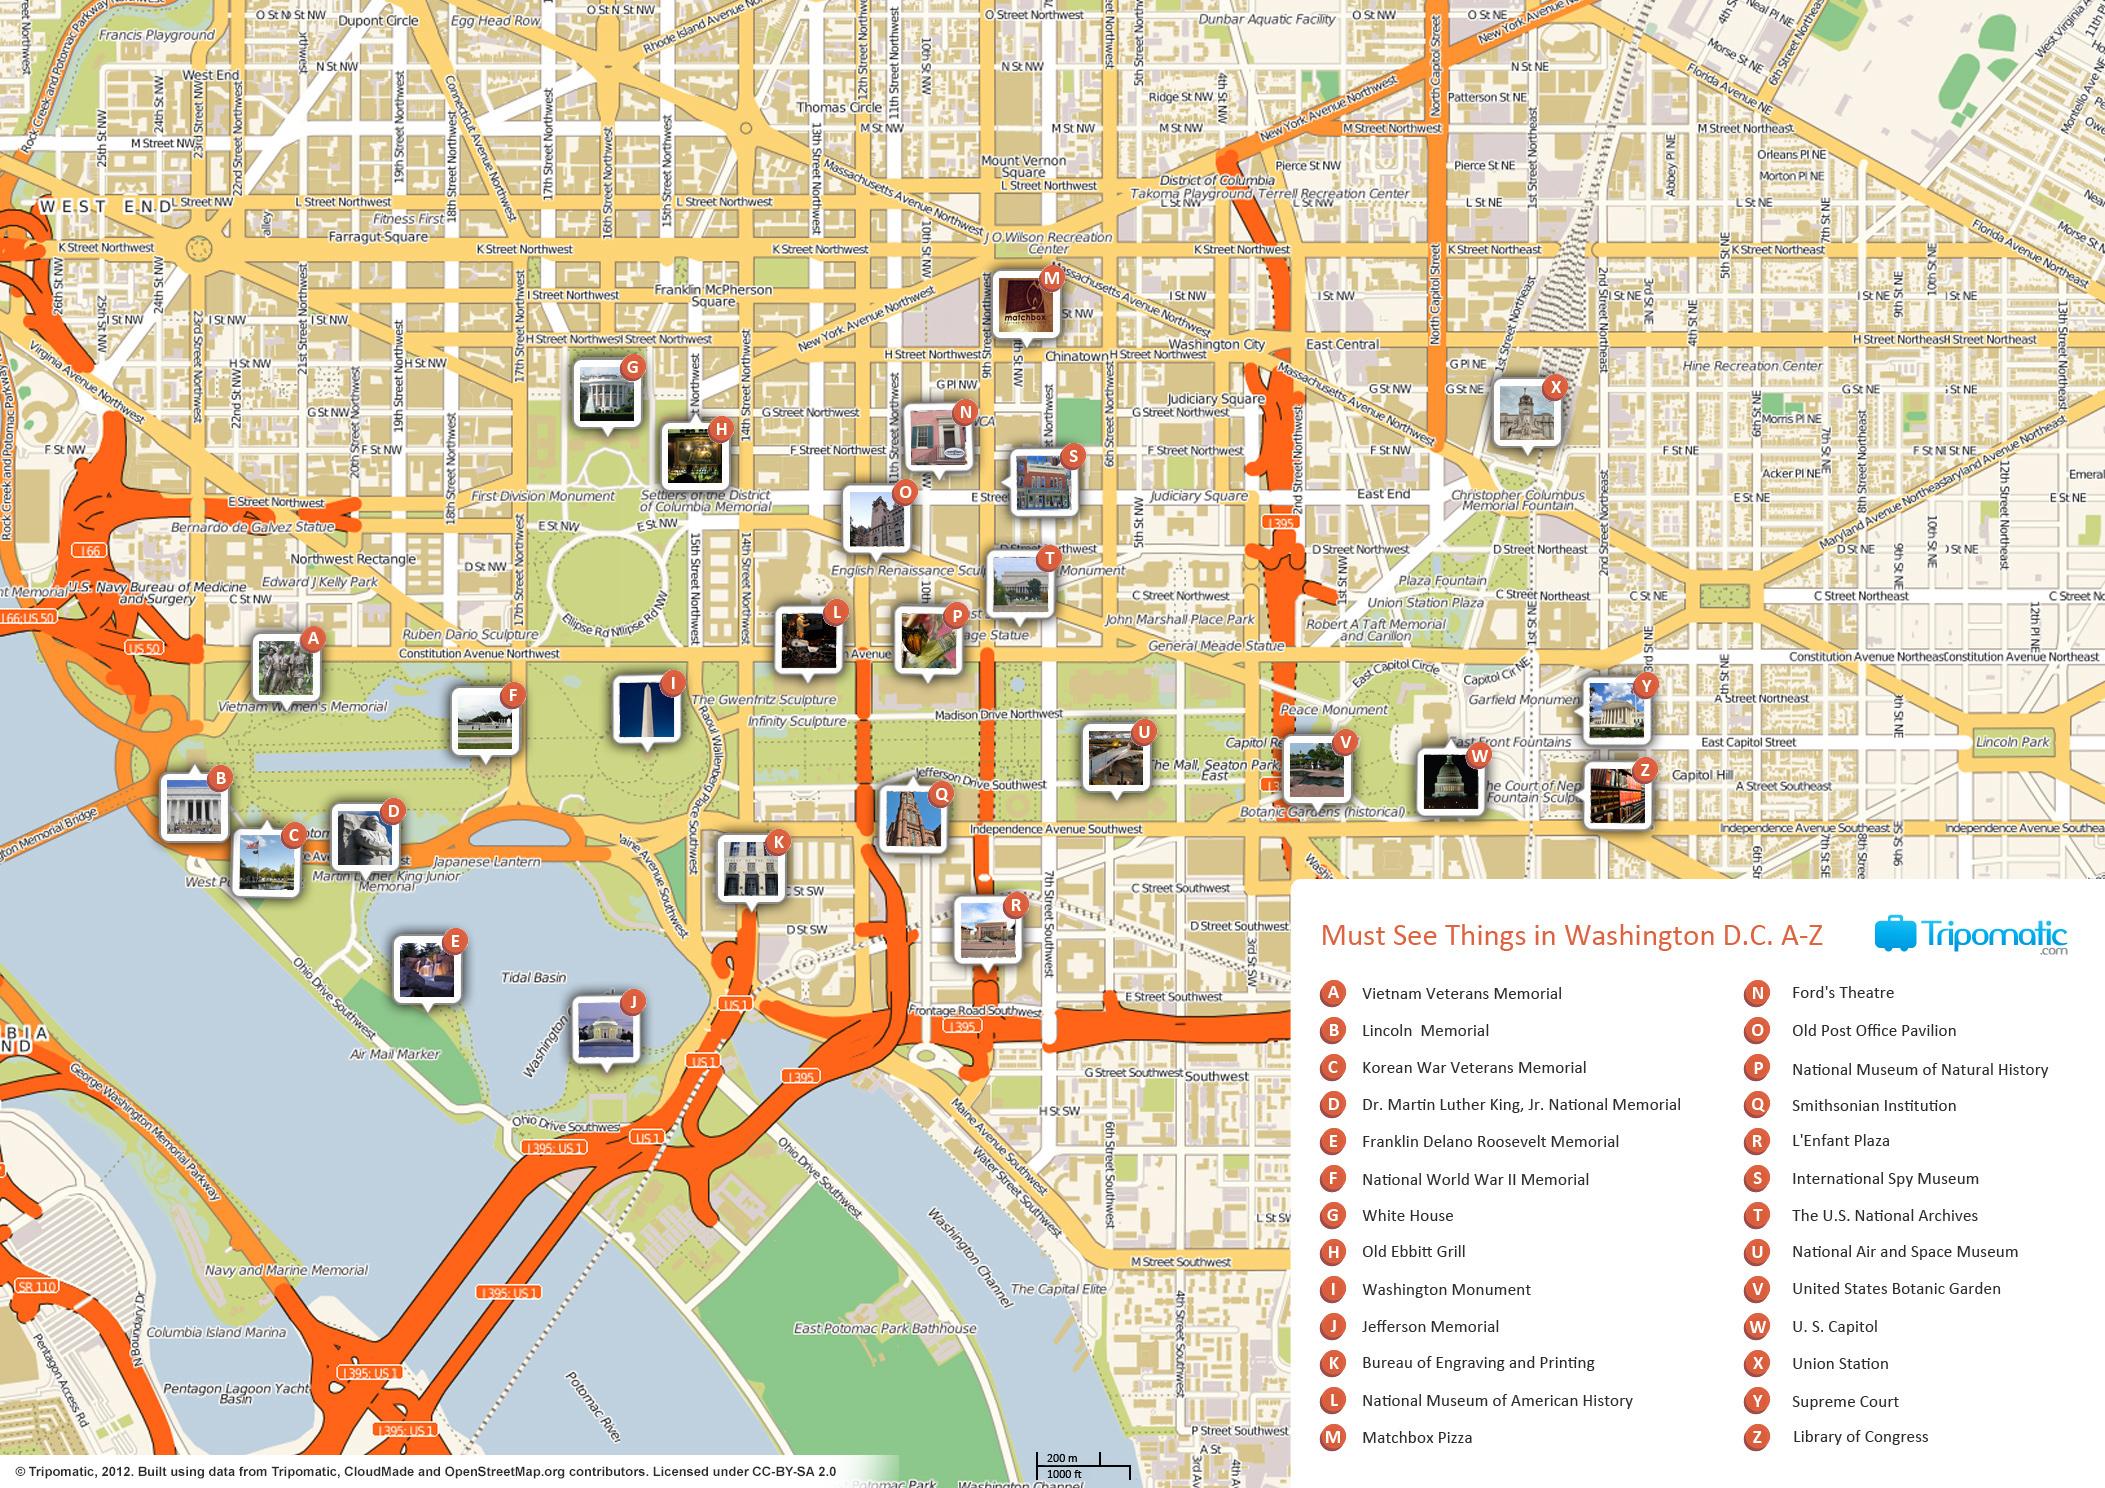 File:washington Dc Printable Tourist Attractions Map - Wikimedia - Printable Map Of Washington Dc Attractions